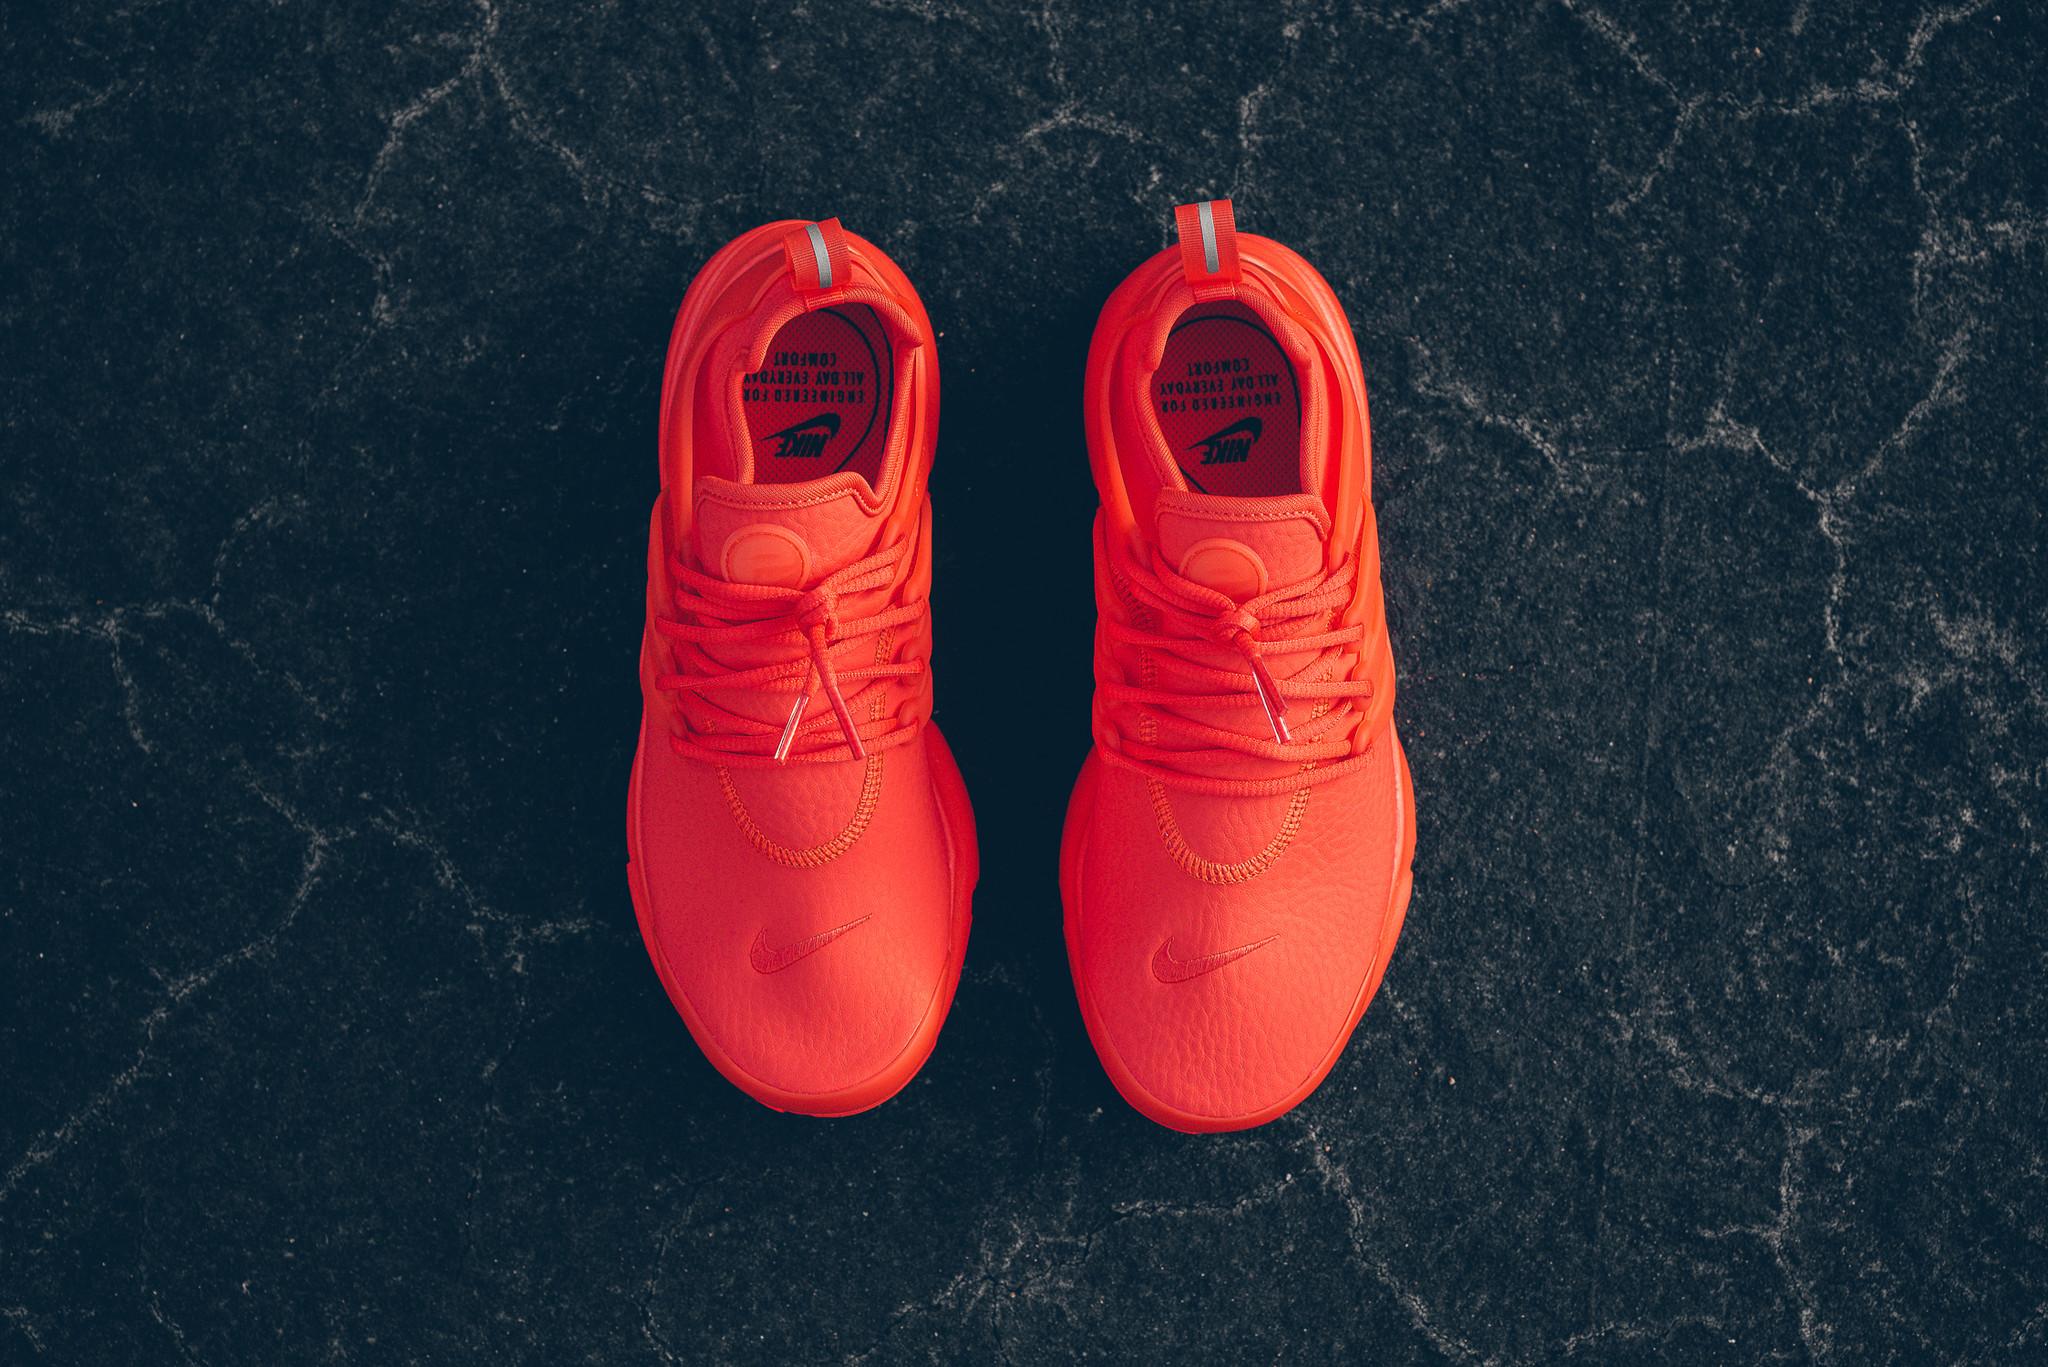 WMNS_Nike_Air_Presto_PRM_Max_Orange_Sneaker_Politics_HypeBeast_2